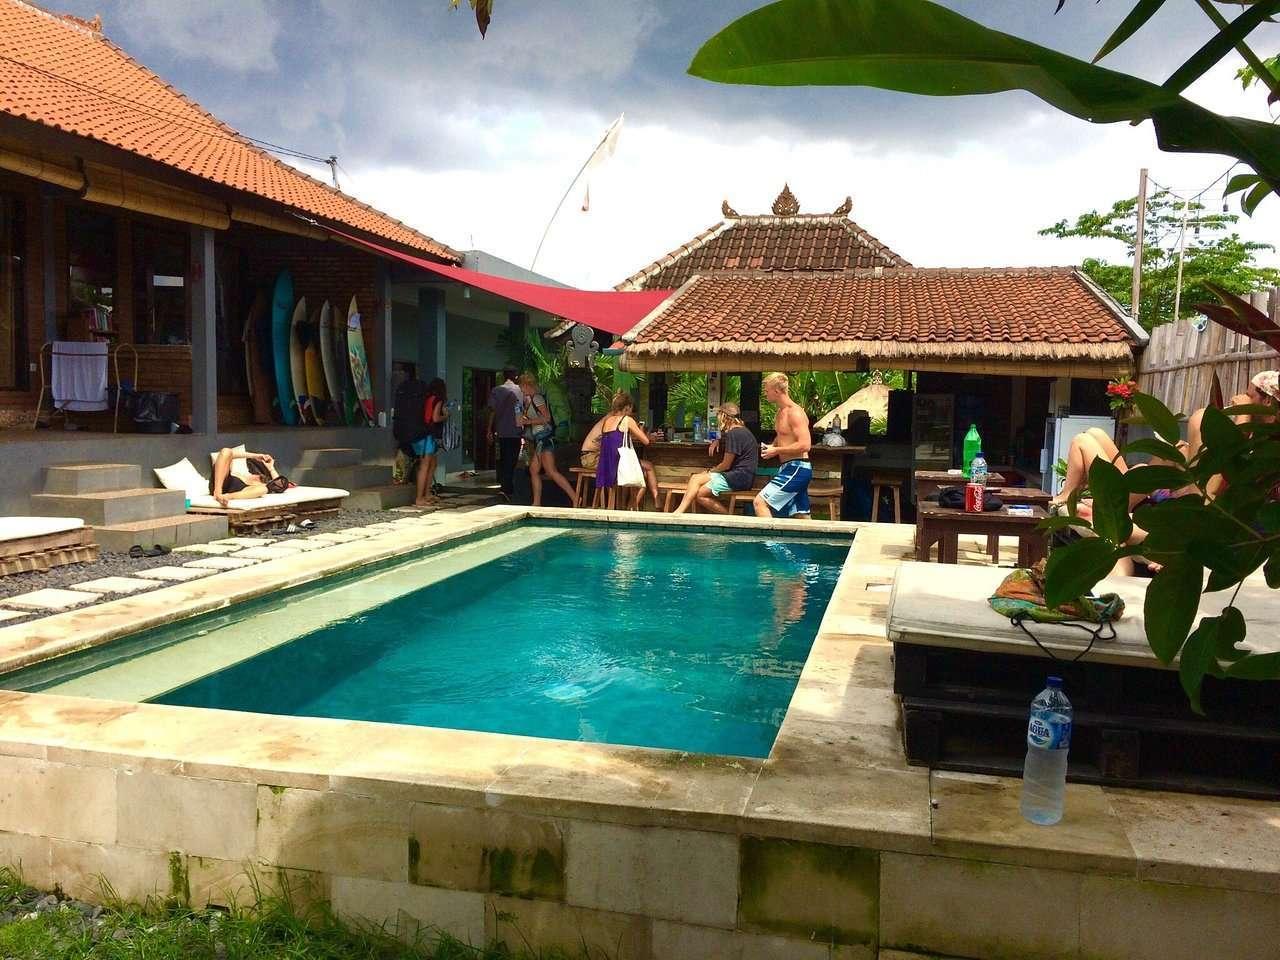 Lay Day Surf Hostel via TripAdvisor